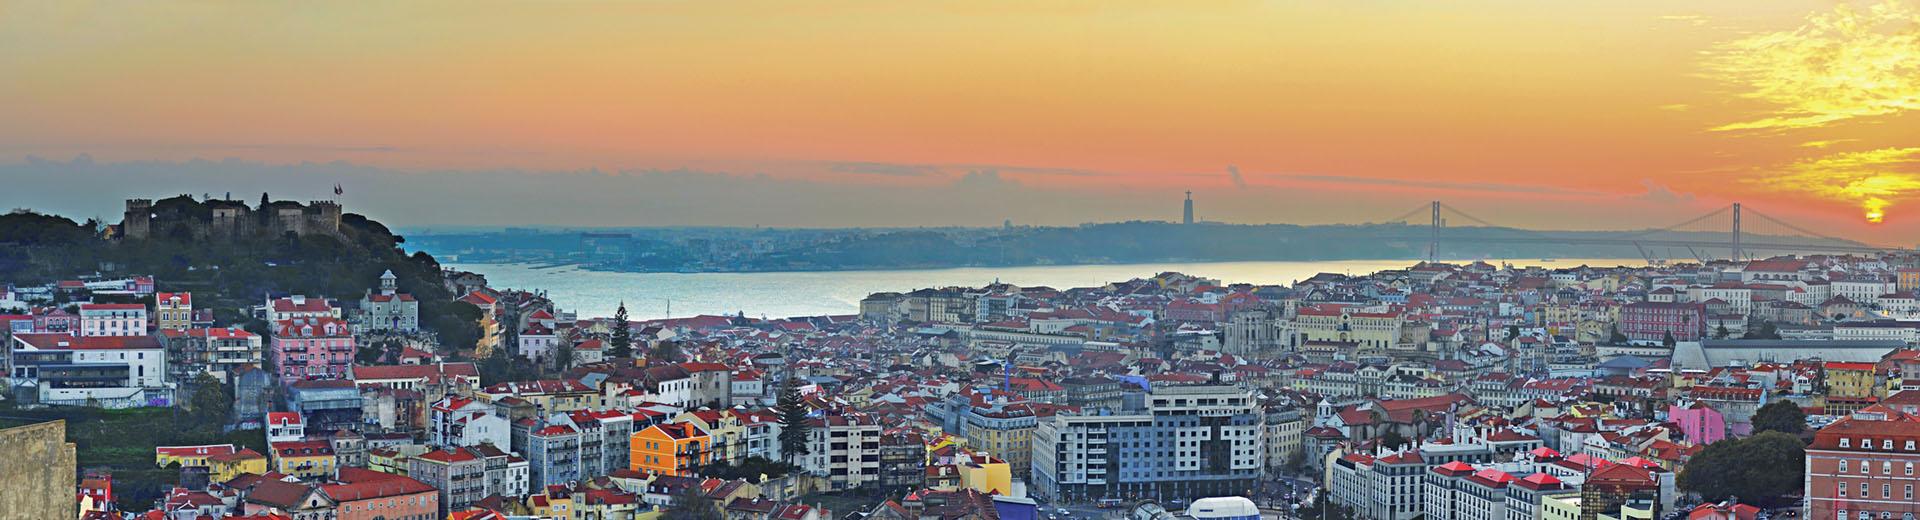 Gruppenreise Lissabon - Package Gruppen Select Flug